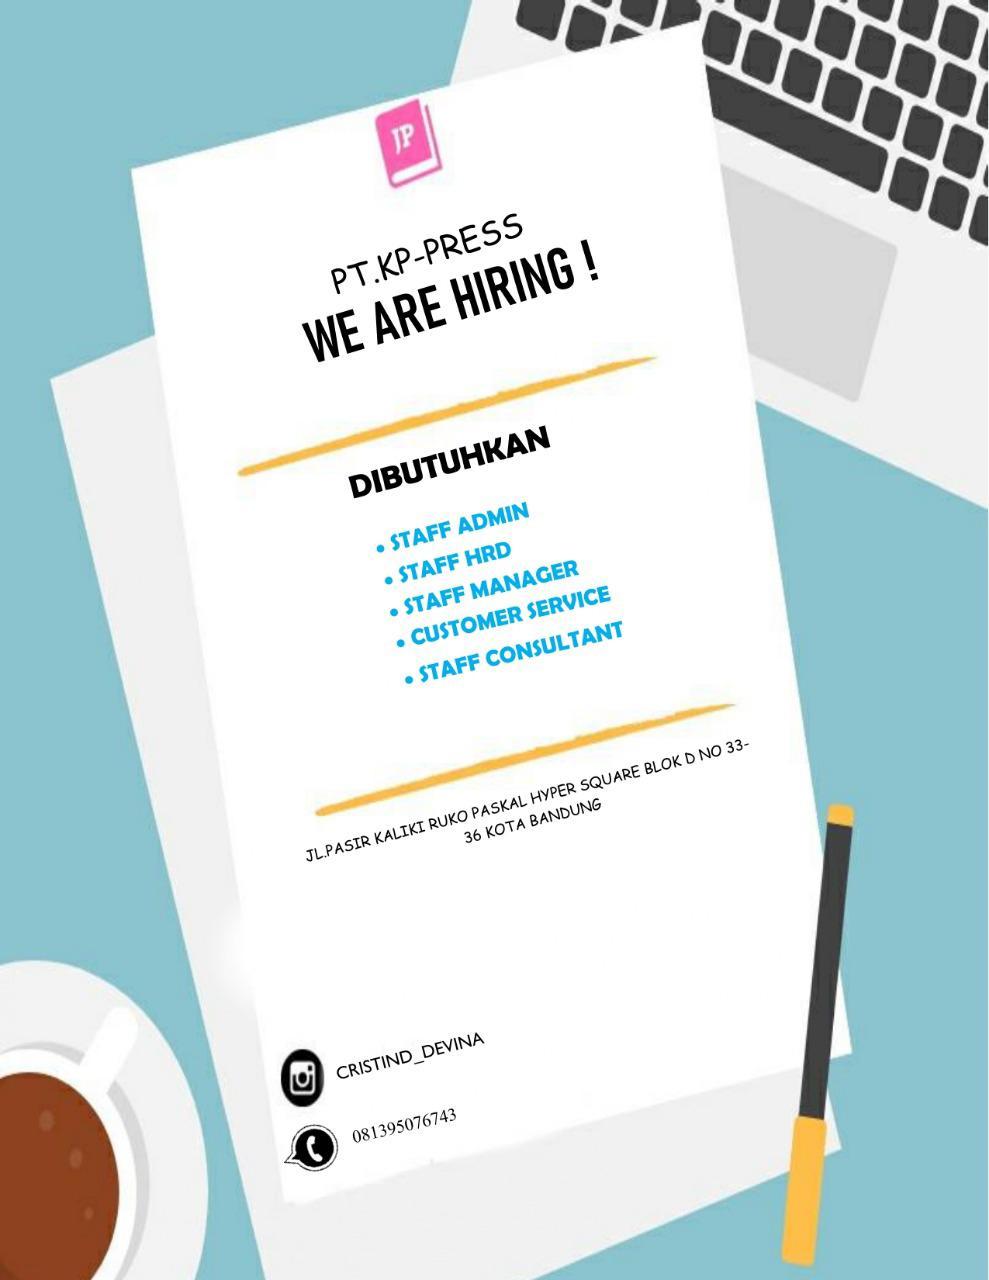 Lowongan Kerja PT. KP-Press Bandung Mei 2020